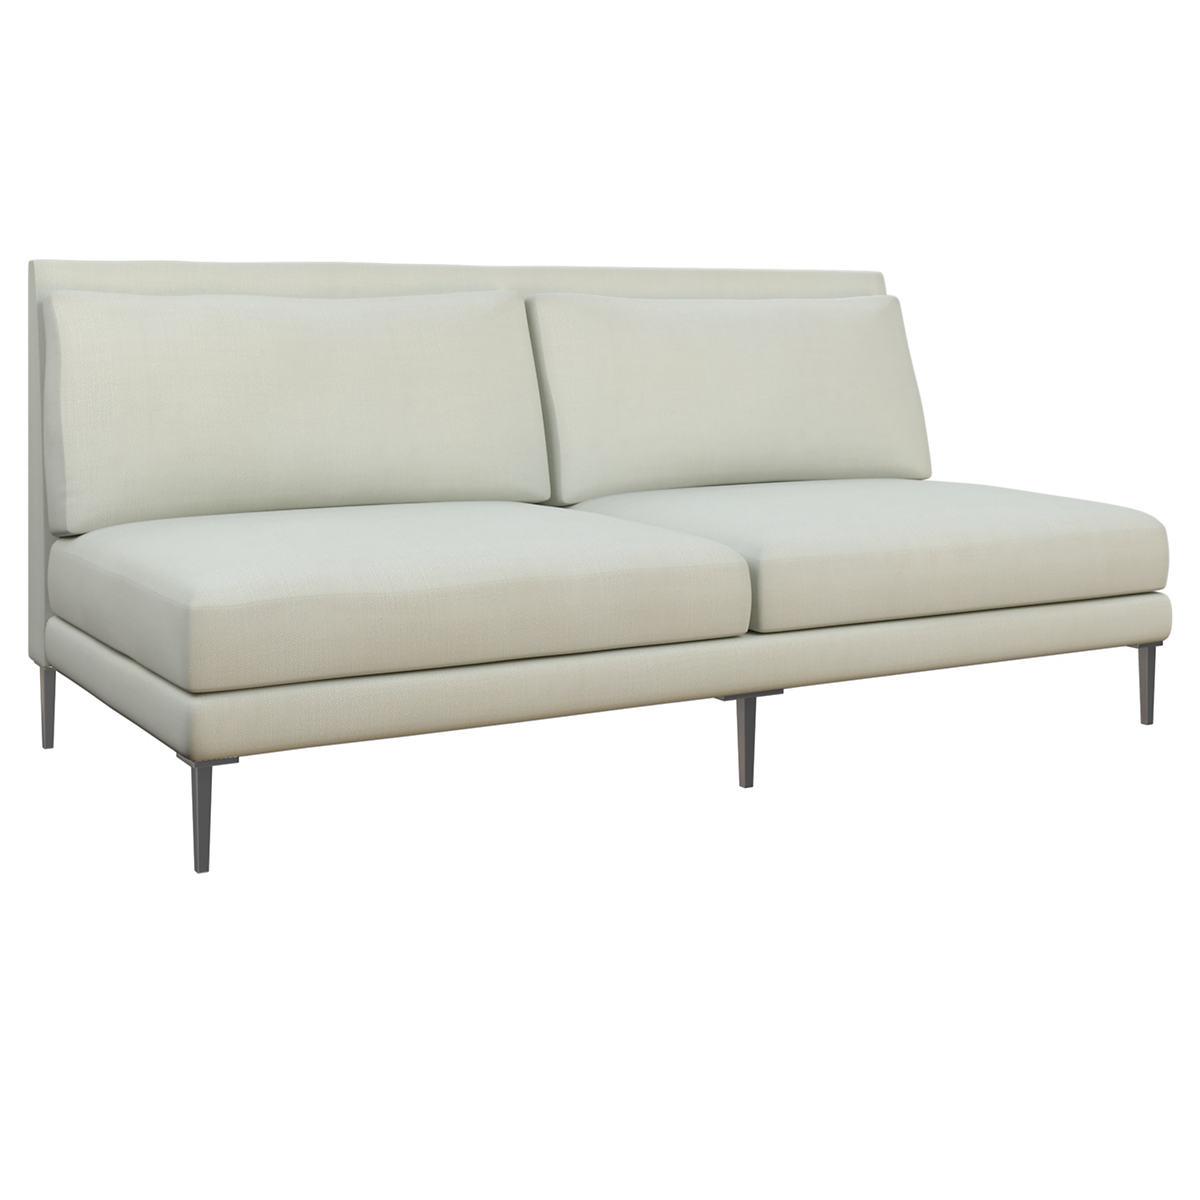 Nubby Mist Portola Sofa